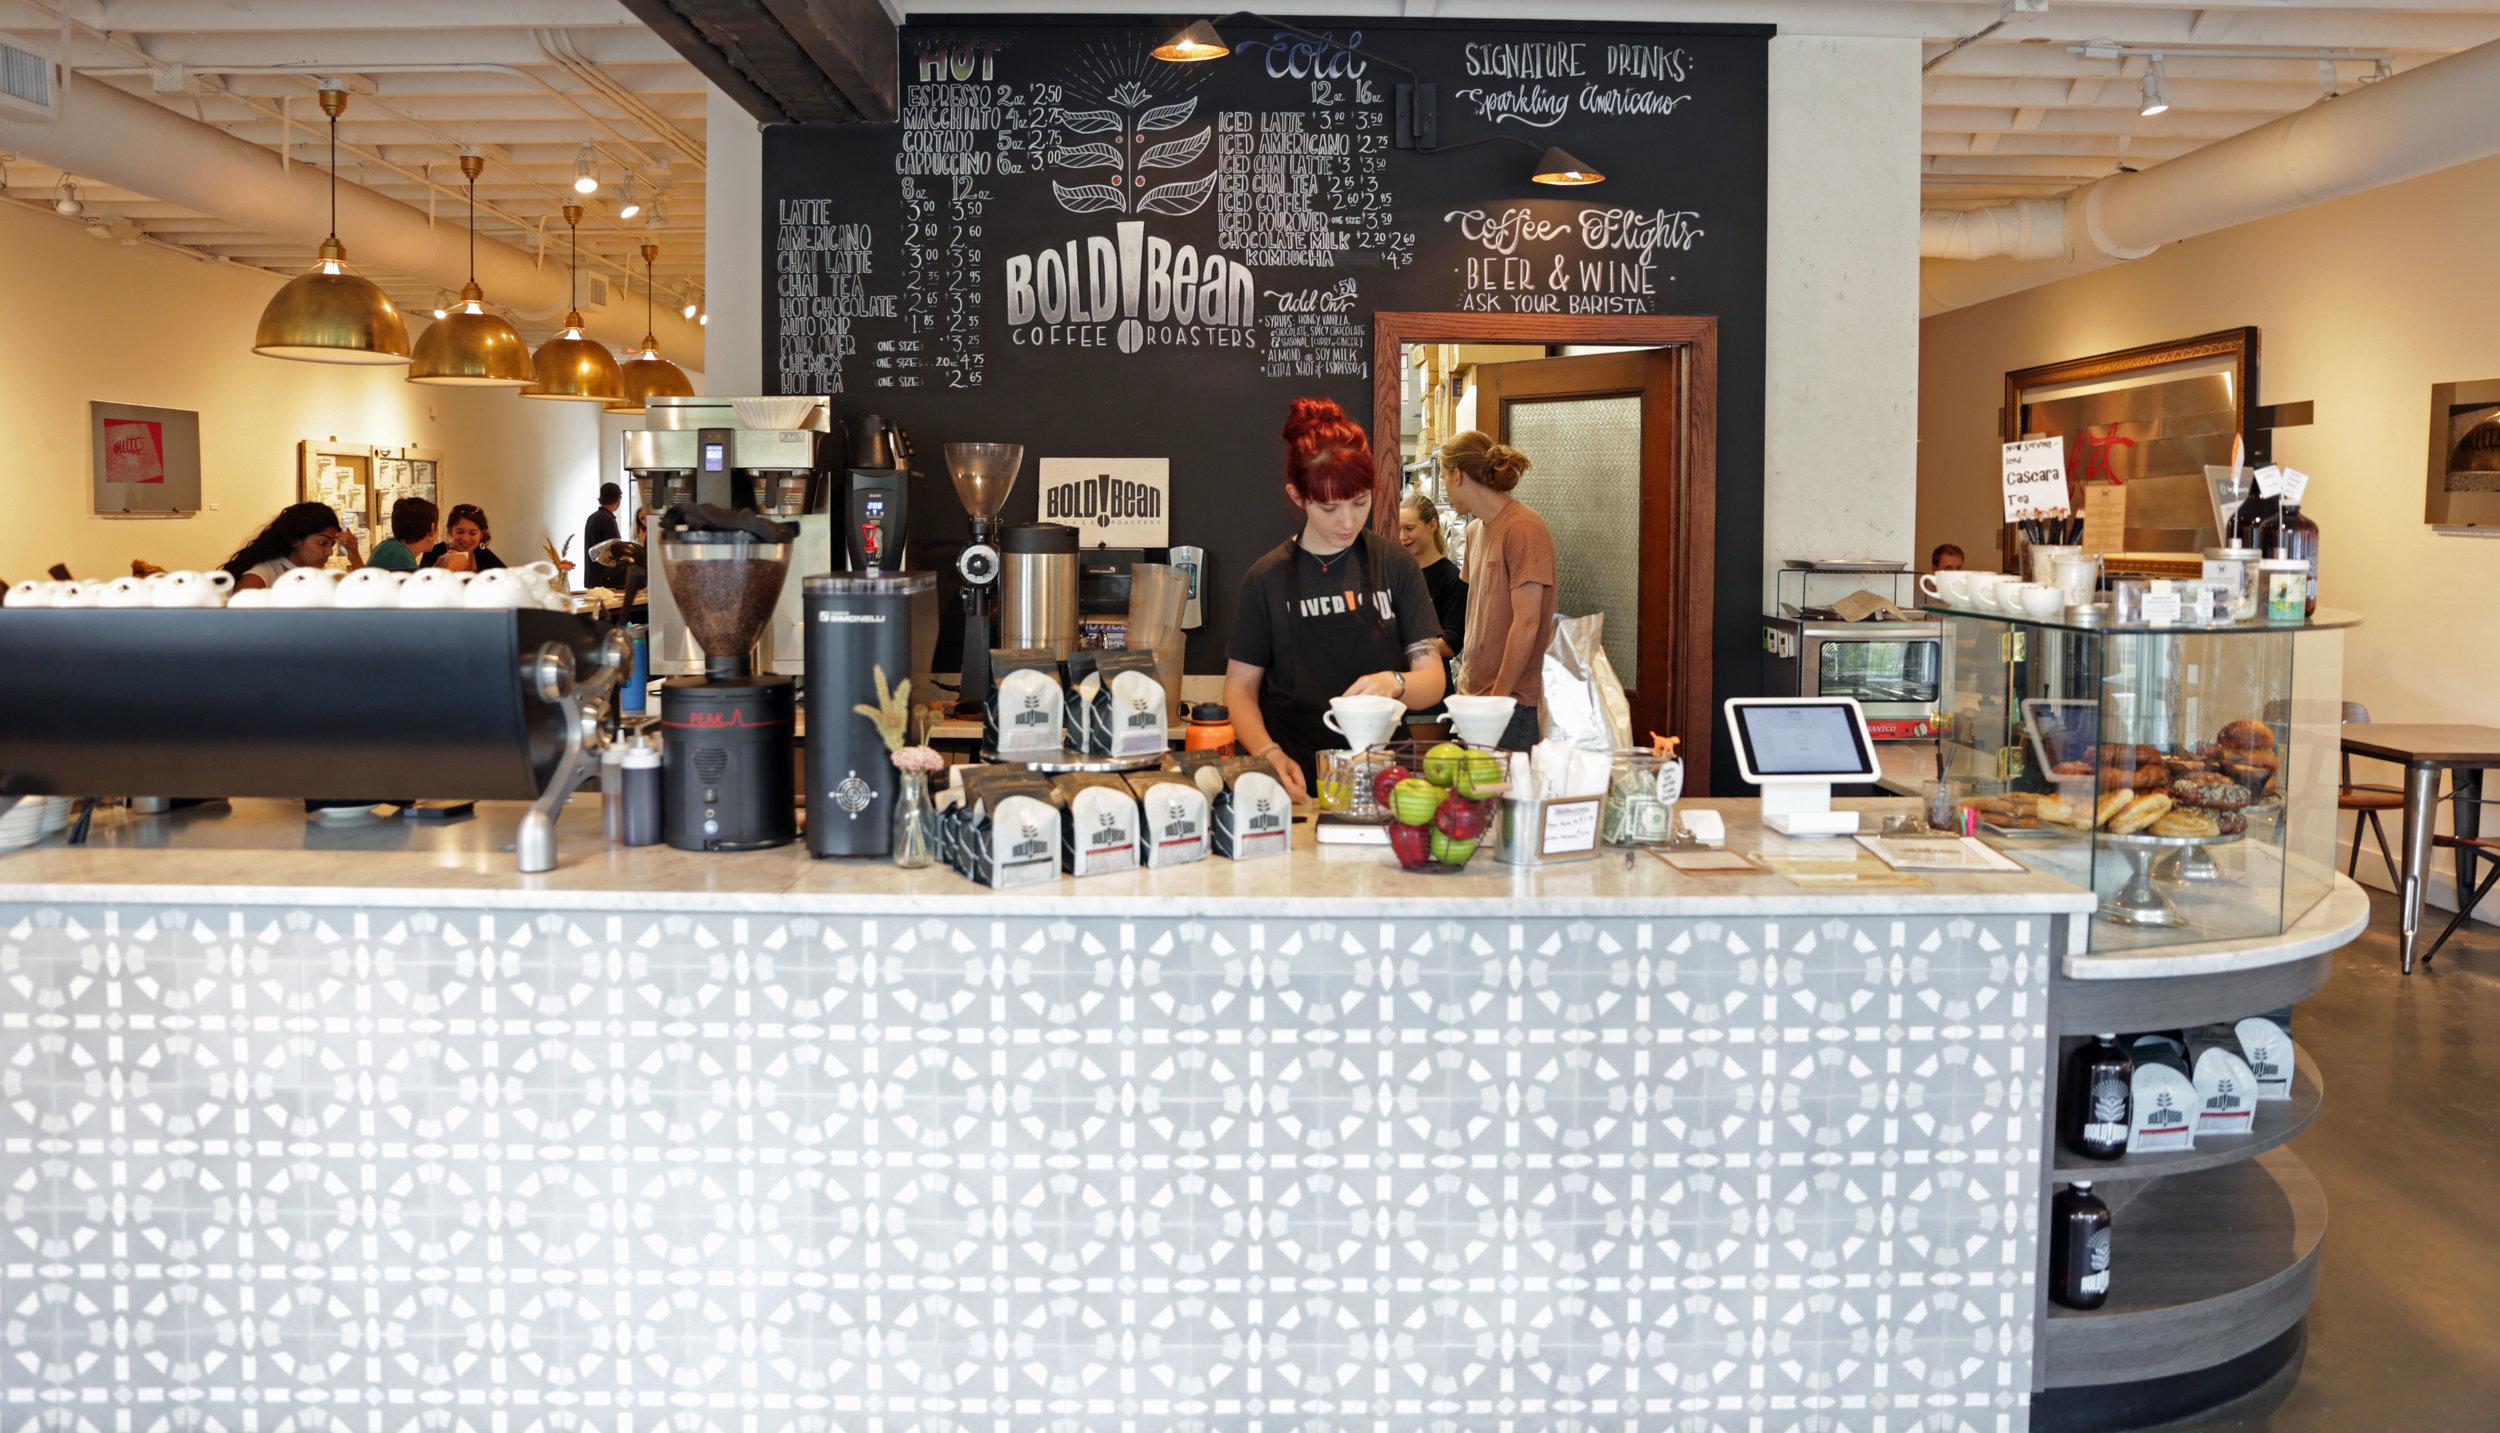 bold-bean-coffee-roasters-jacksonville_counter_coffee.jpg